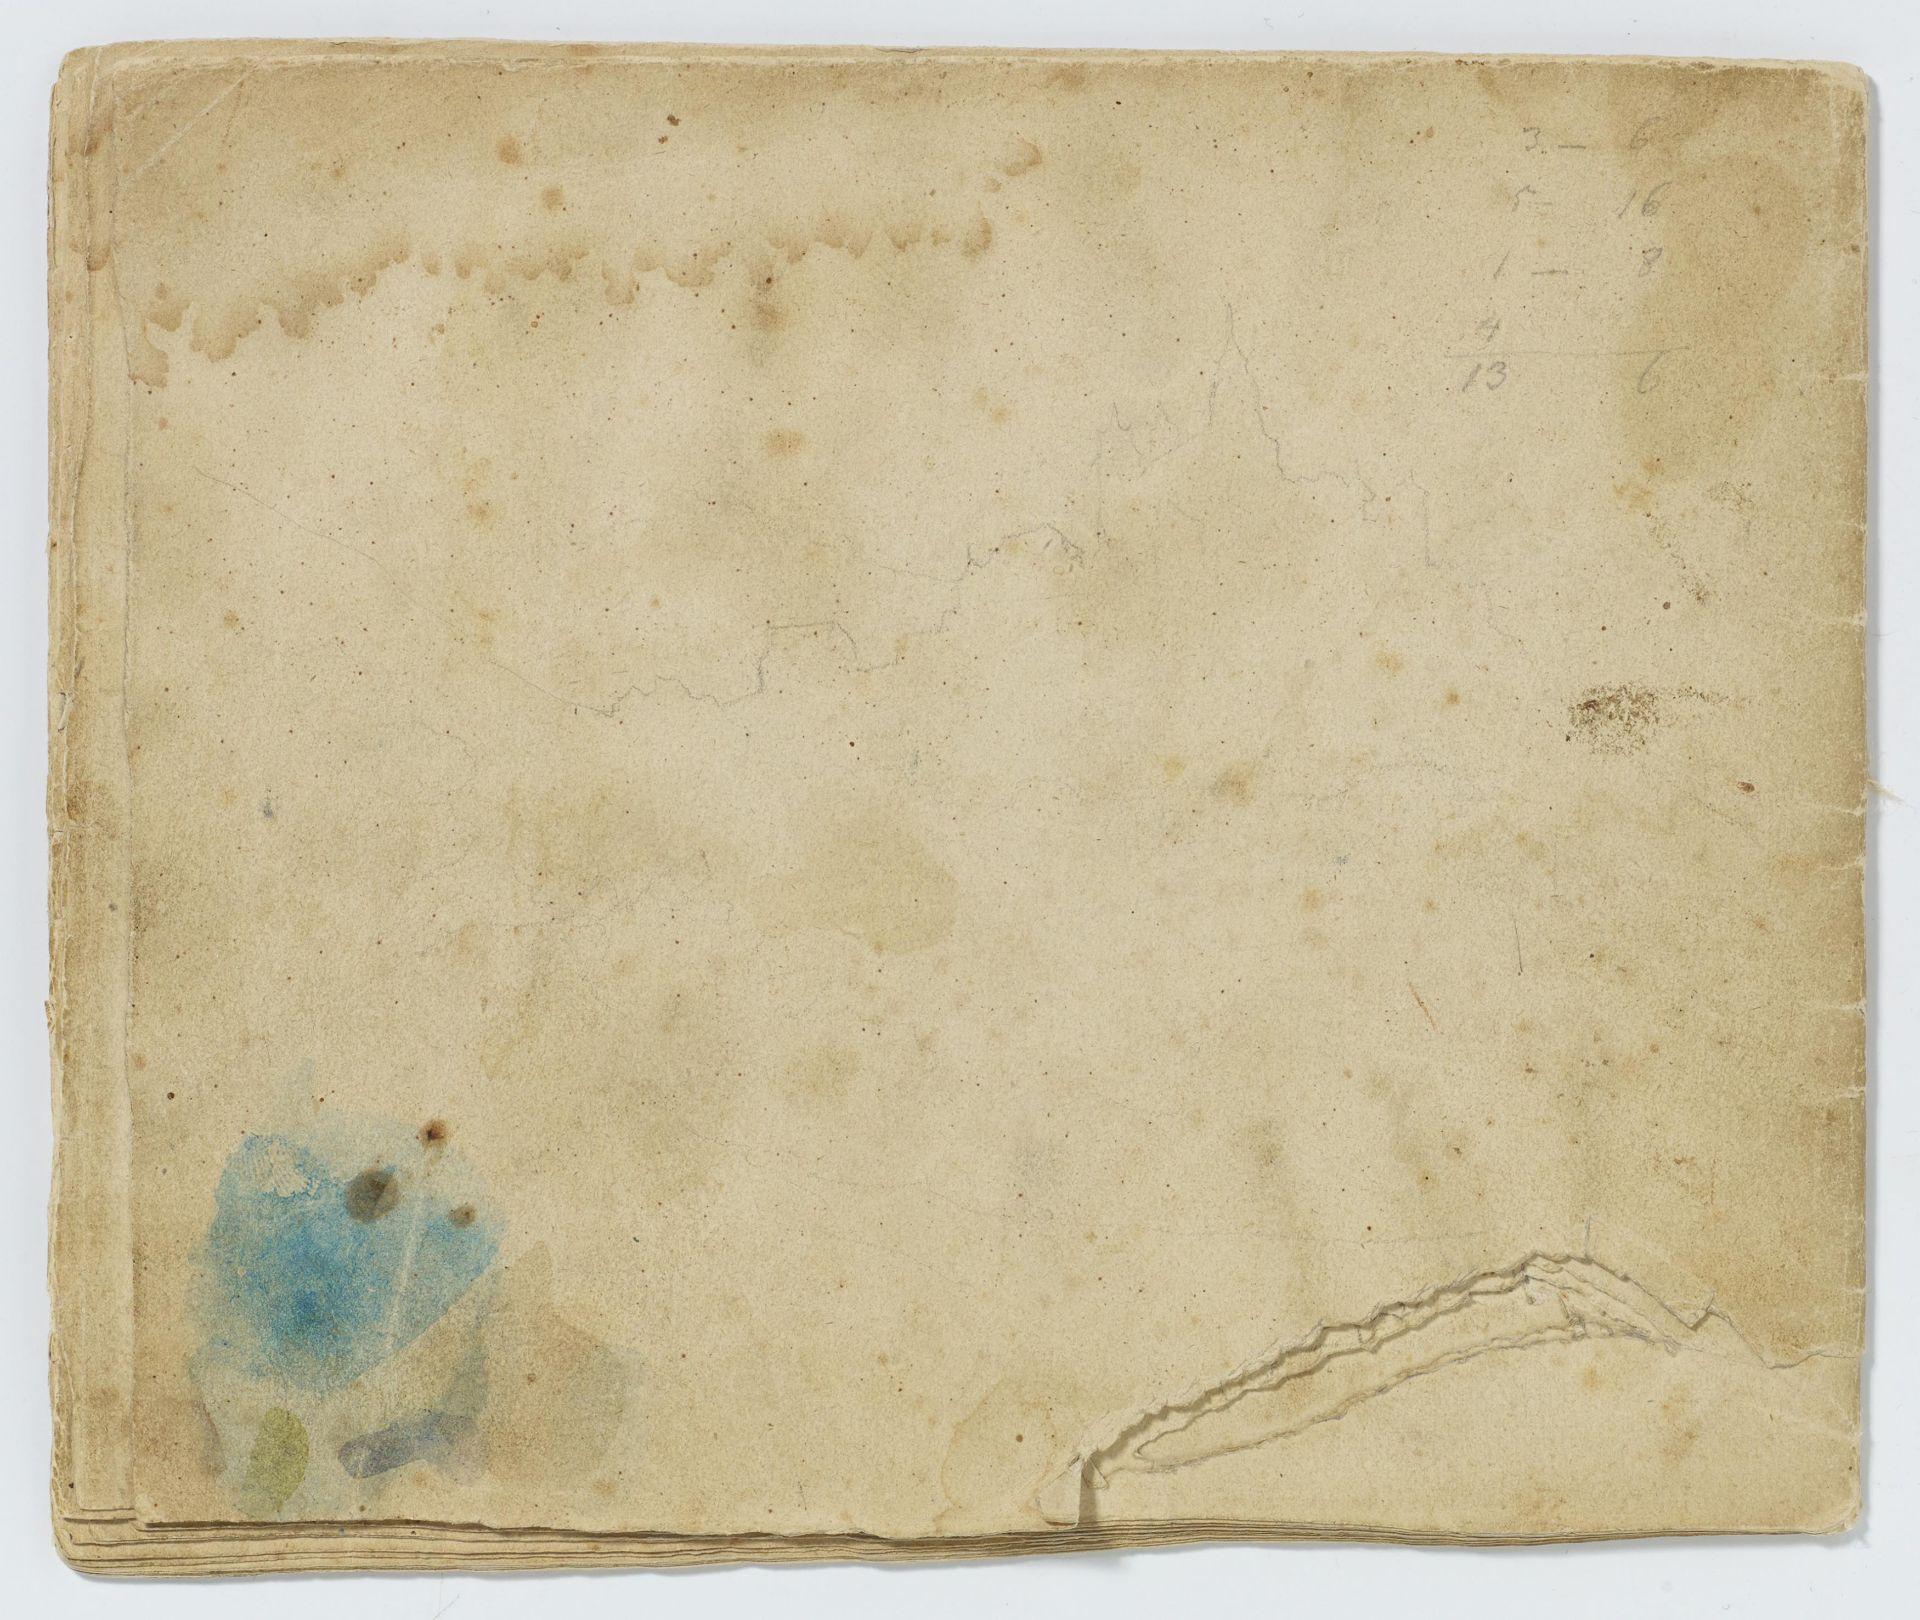 Kaupert, Gustav Kassel 1819 - 1897  Sketchbook, two booklets, each ca. 17 pages. Architectural - Bild 3 aus 8